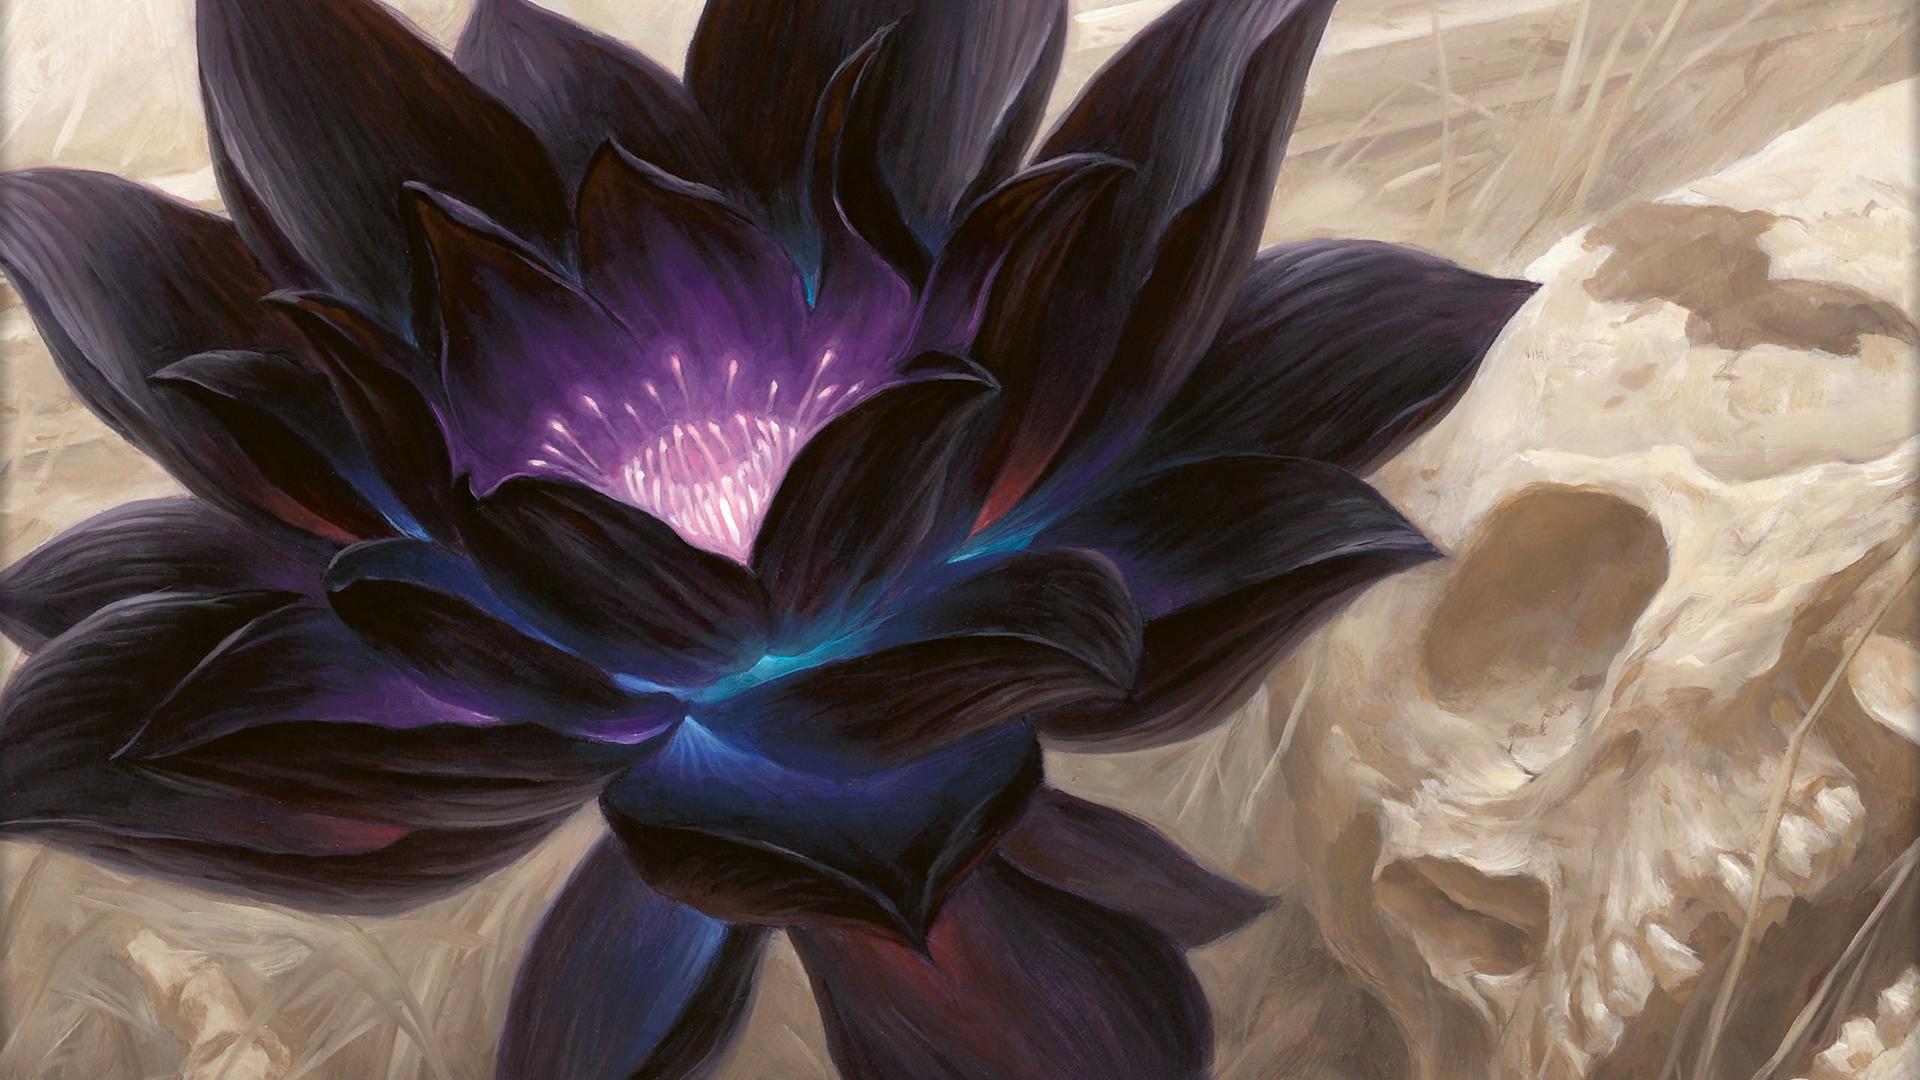 Wallpaper Digital Art Lotus Flowers Skull 1920x1080 Alex93s